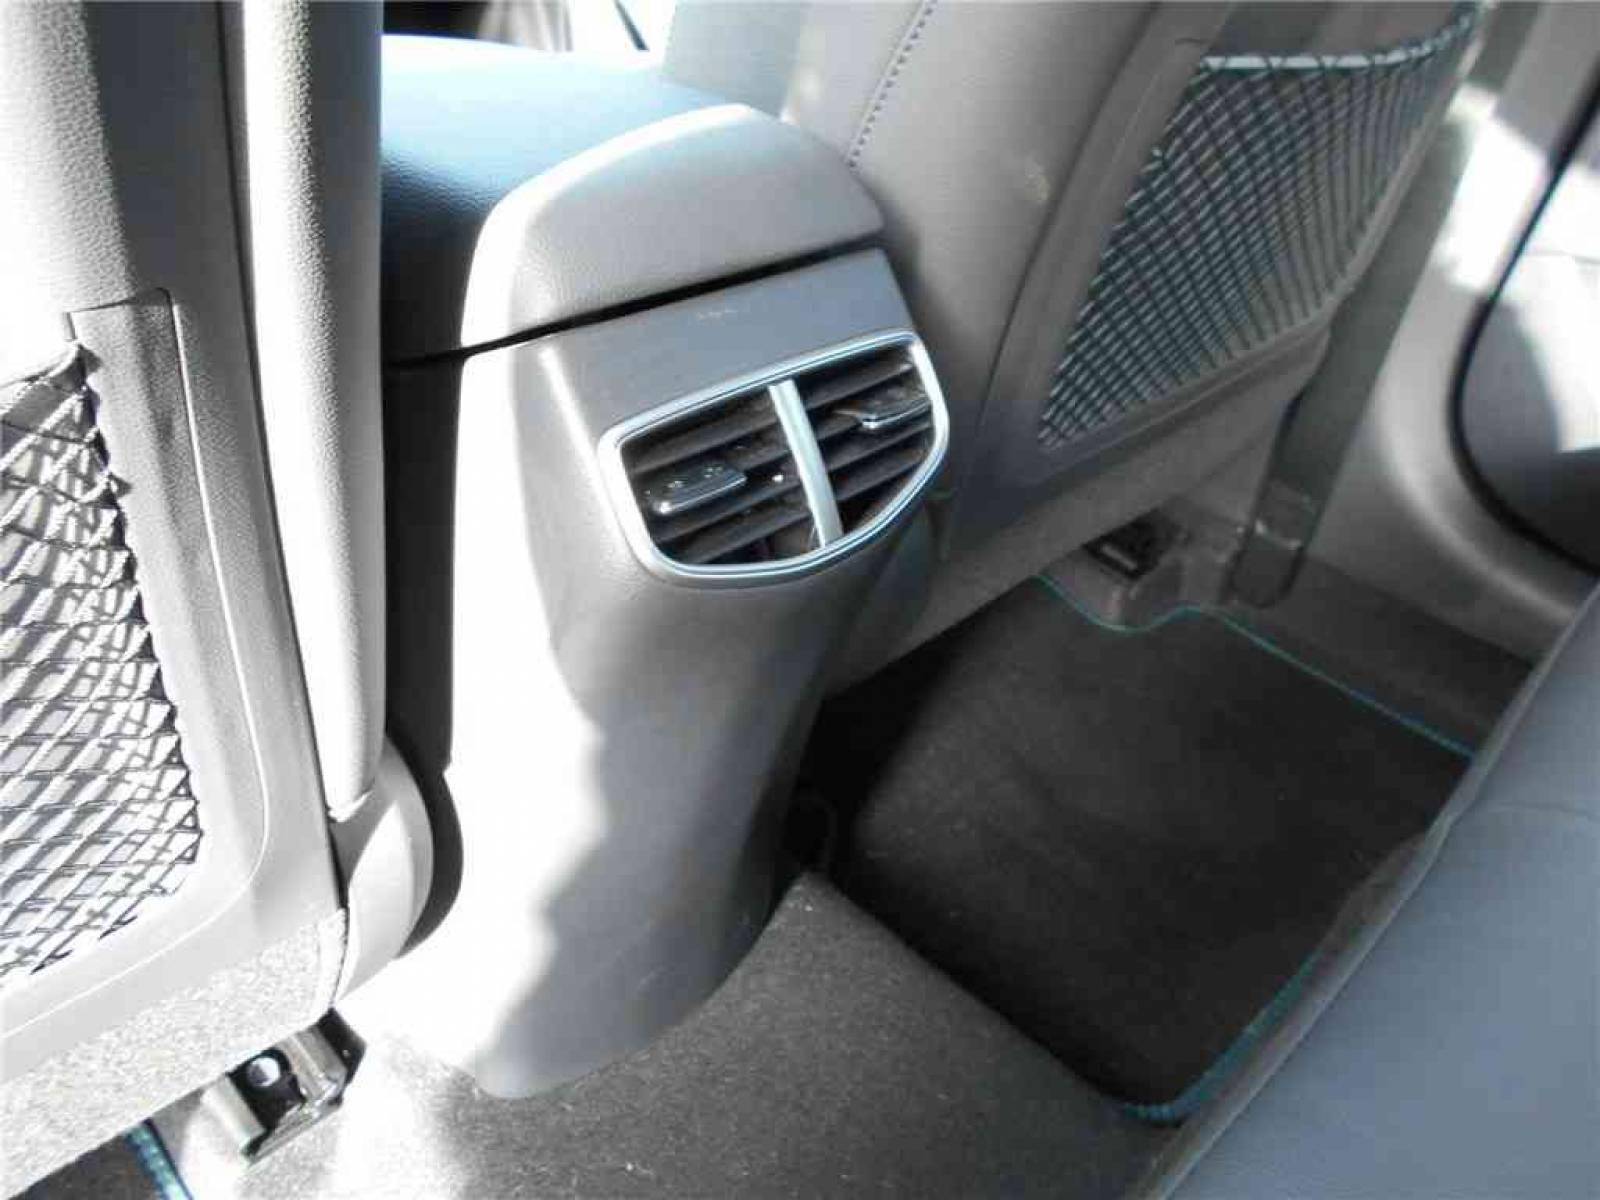 HYUNDAI Ioniq Plug-in 141 ch - véhicule d'occasion - Groupe Guillet - Chalon Automobiles - 71100 - Chalon-sur-Saône - 26